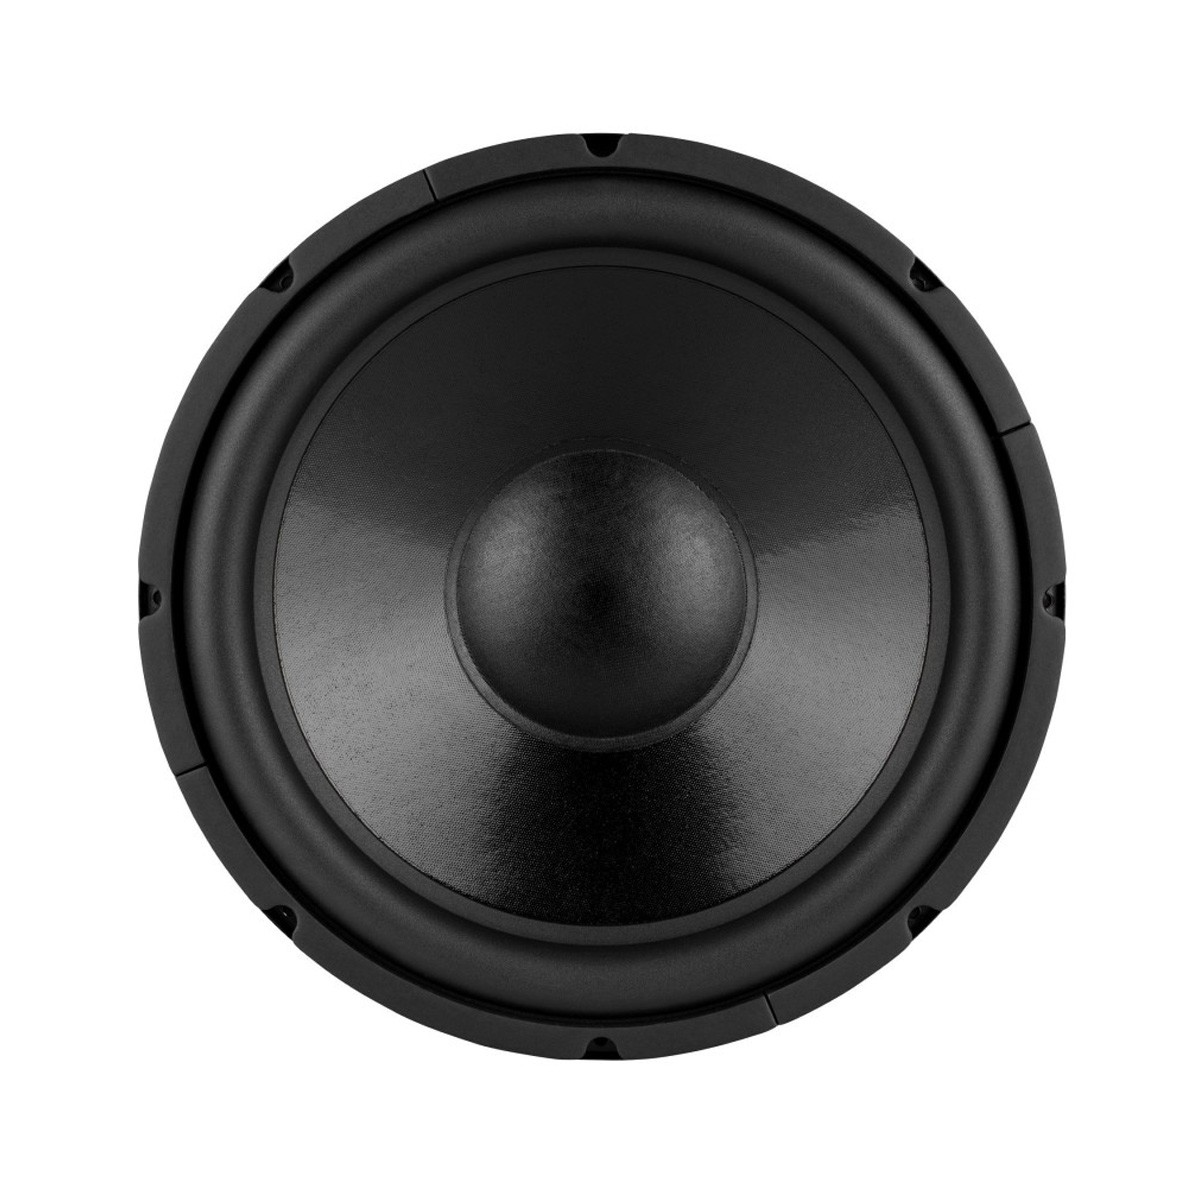 DAYTON AUDIO DCS380-4 Speaker Driver Subwoofer 250W 4 Ohm 94dB 20Hz - 500Hz Ø38.1cm